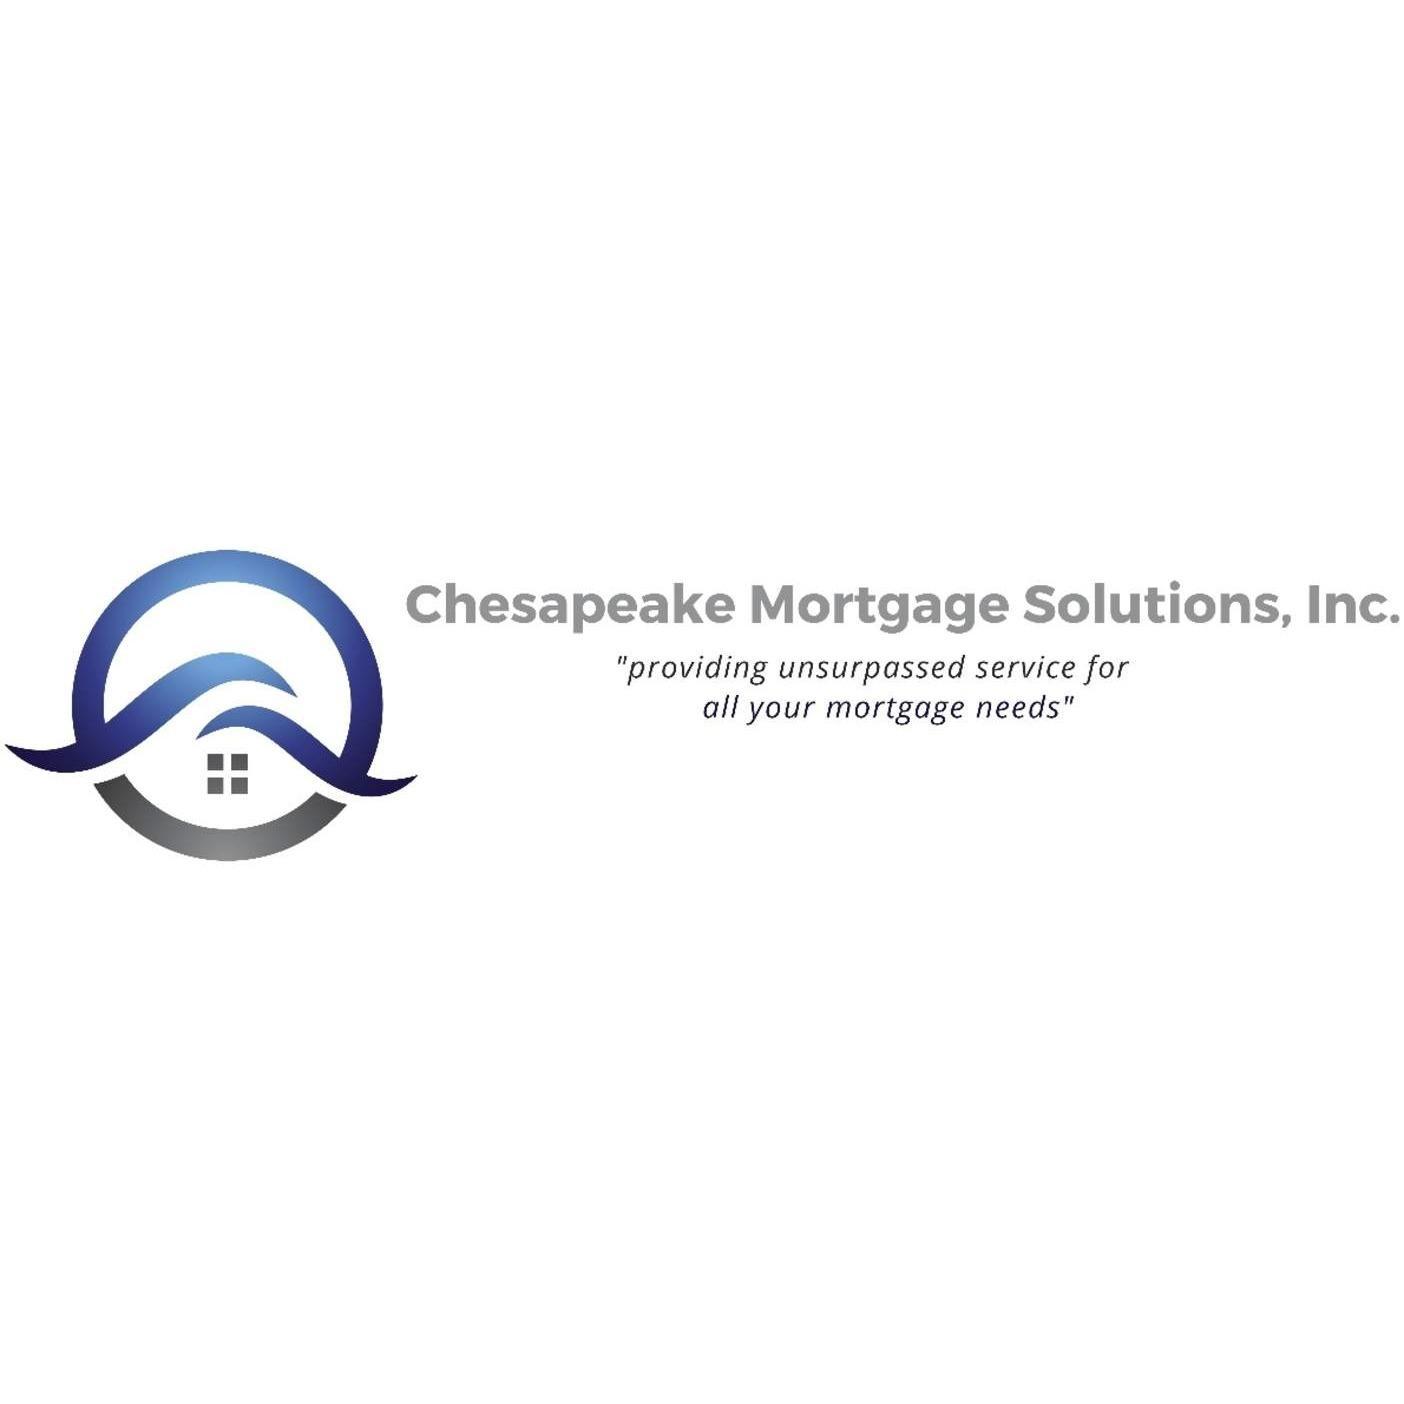 Chesapeake Mortgage Solutions, Inc.